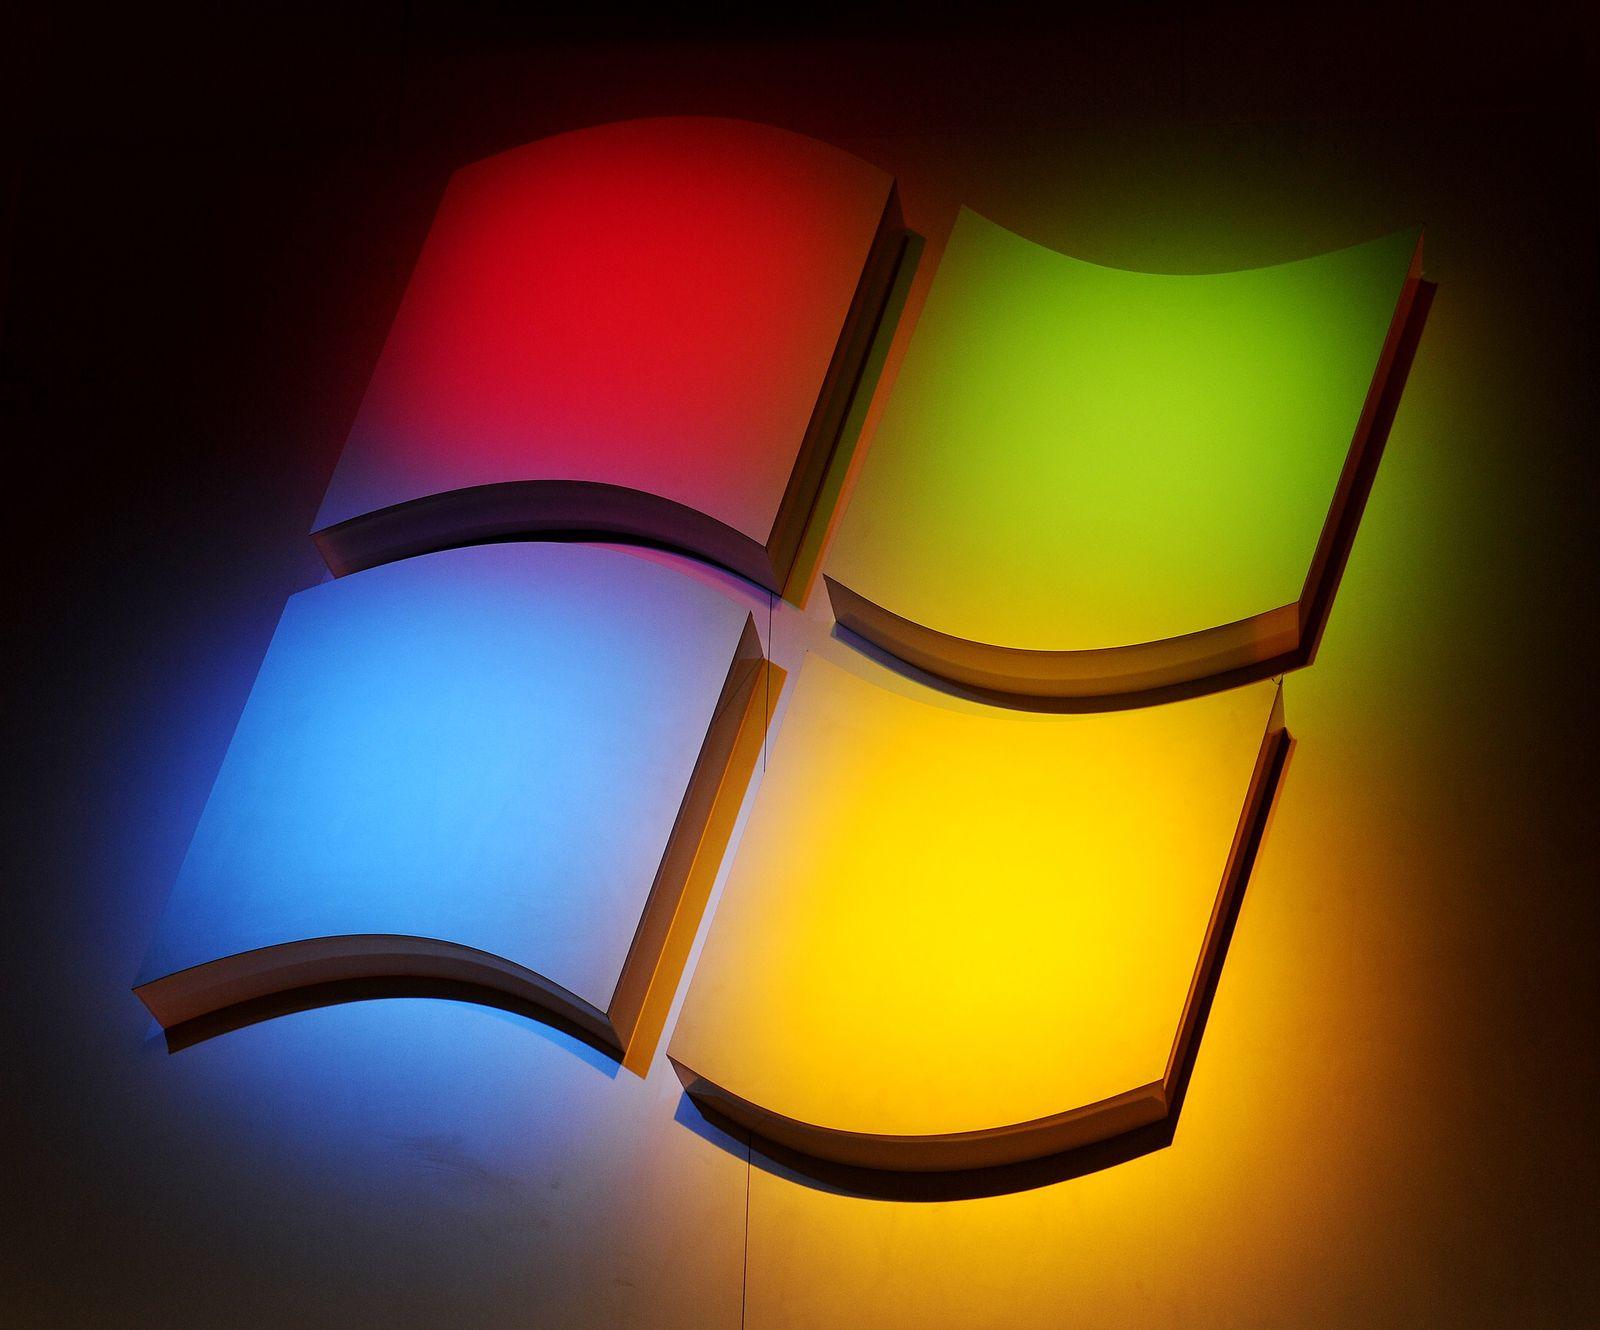 Microsoft Symbolbild (Kopie)